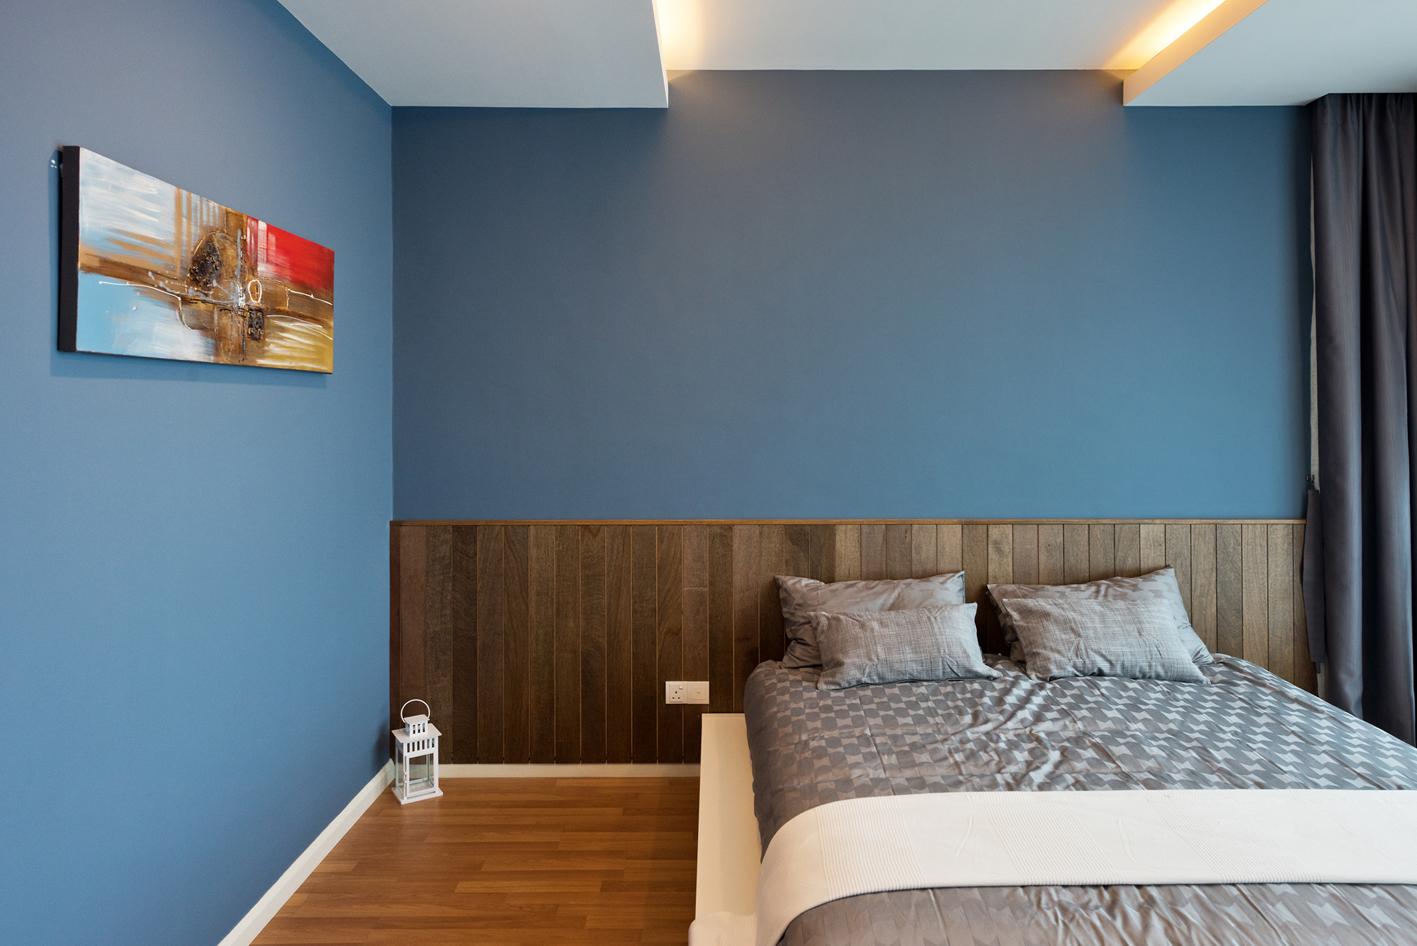 9 Bedroom Designs That Help You to Sleep Better